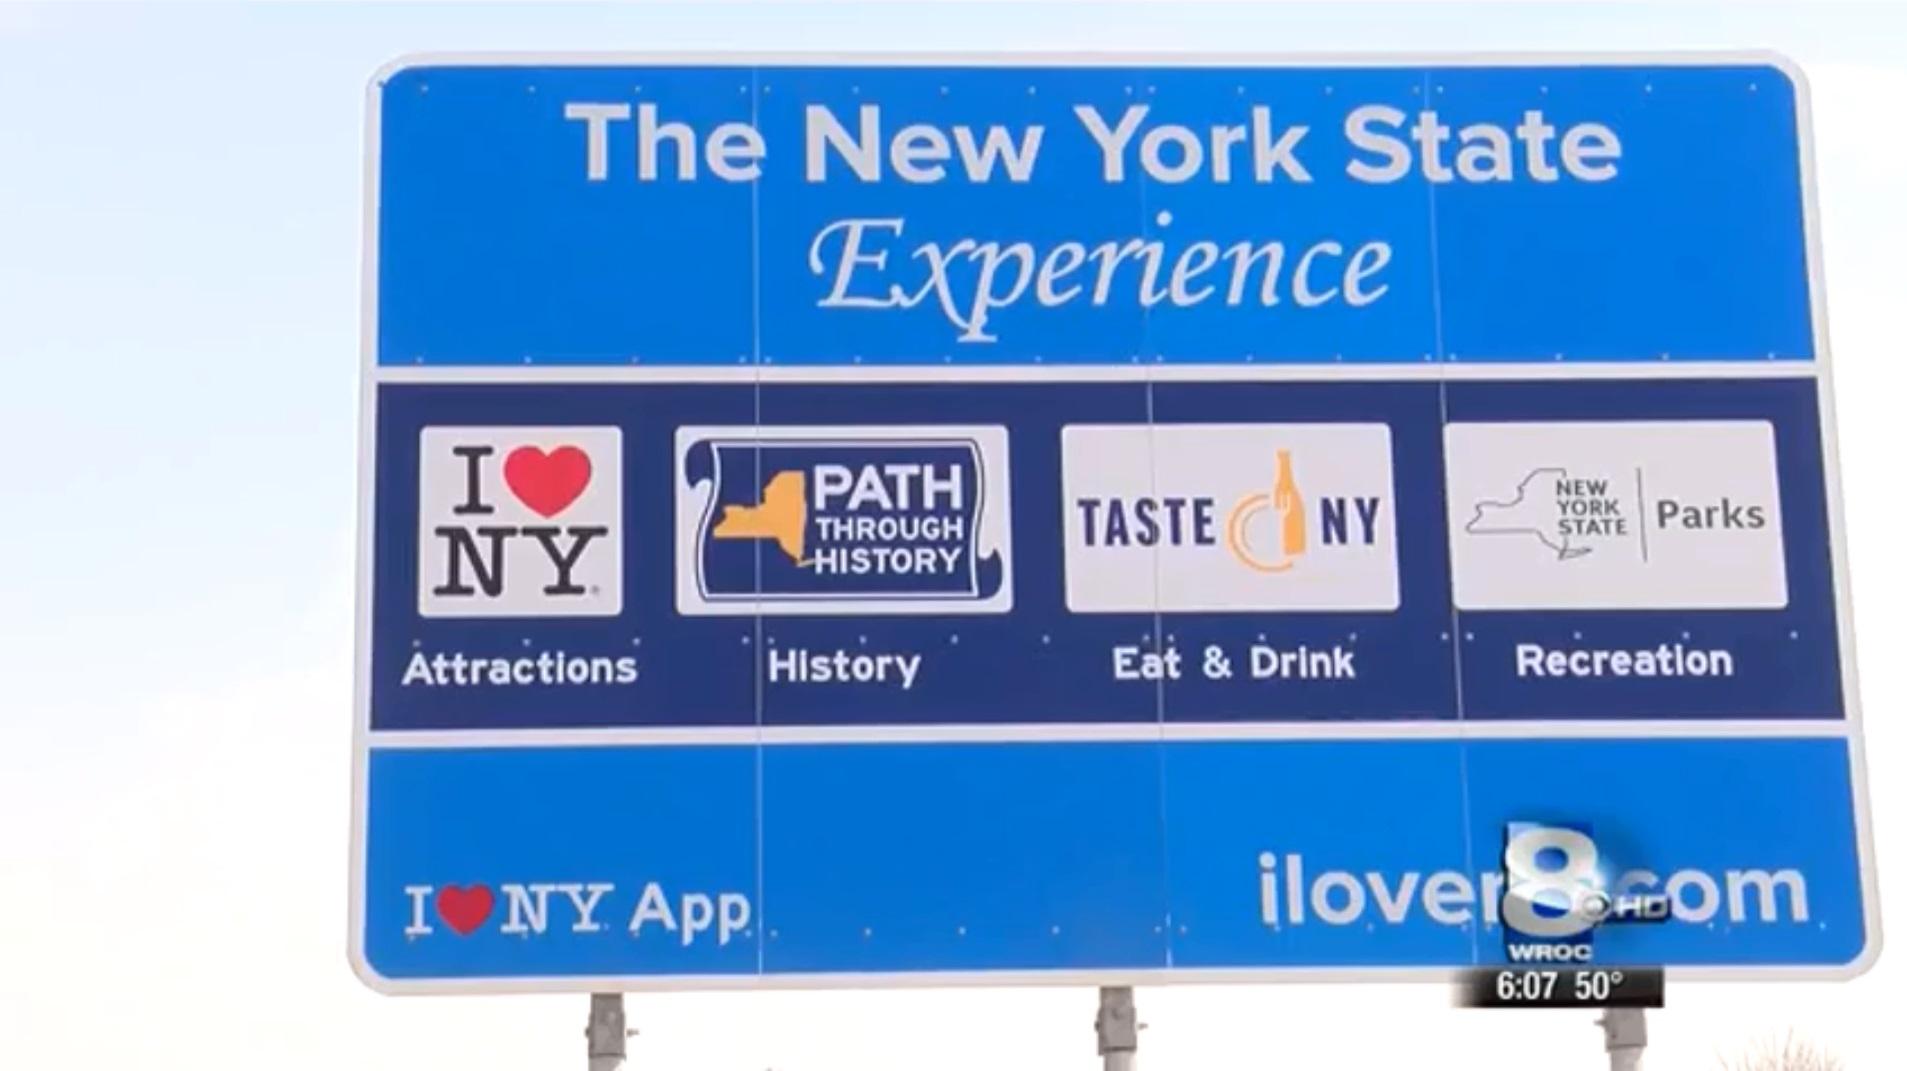 i love ny signs_1517518508946.jpg.jpg